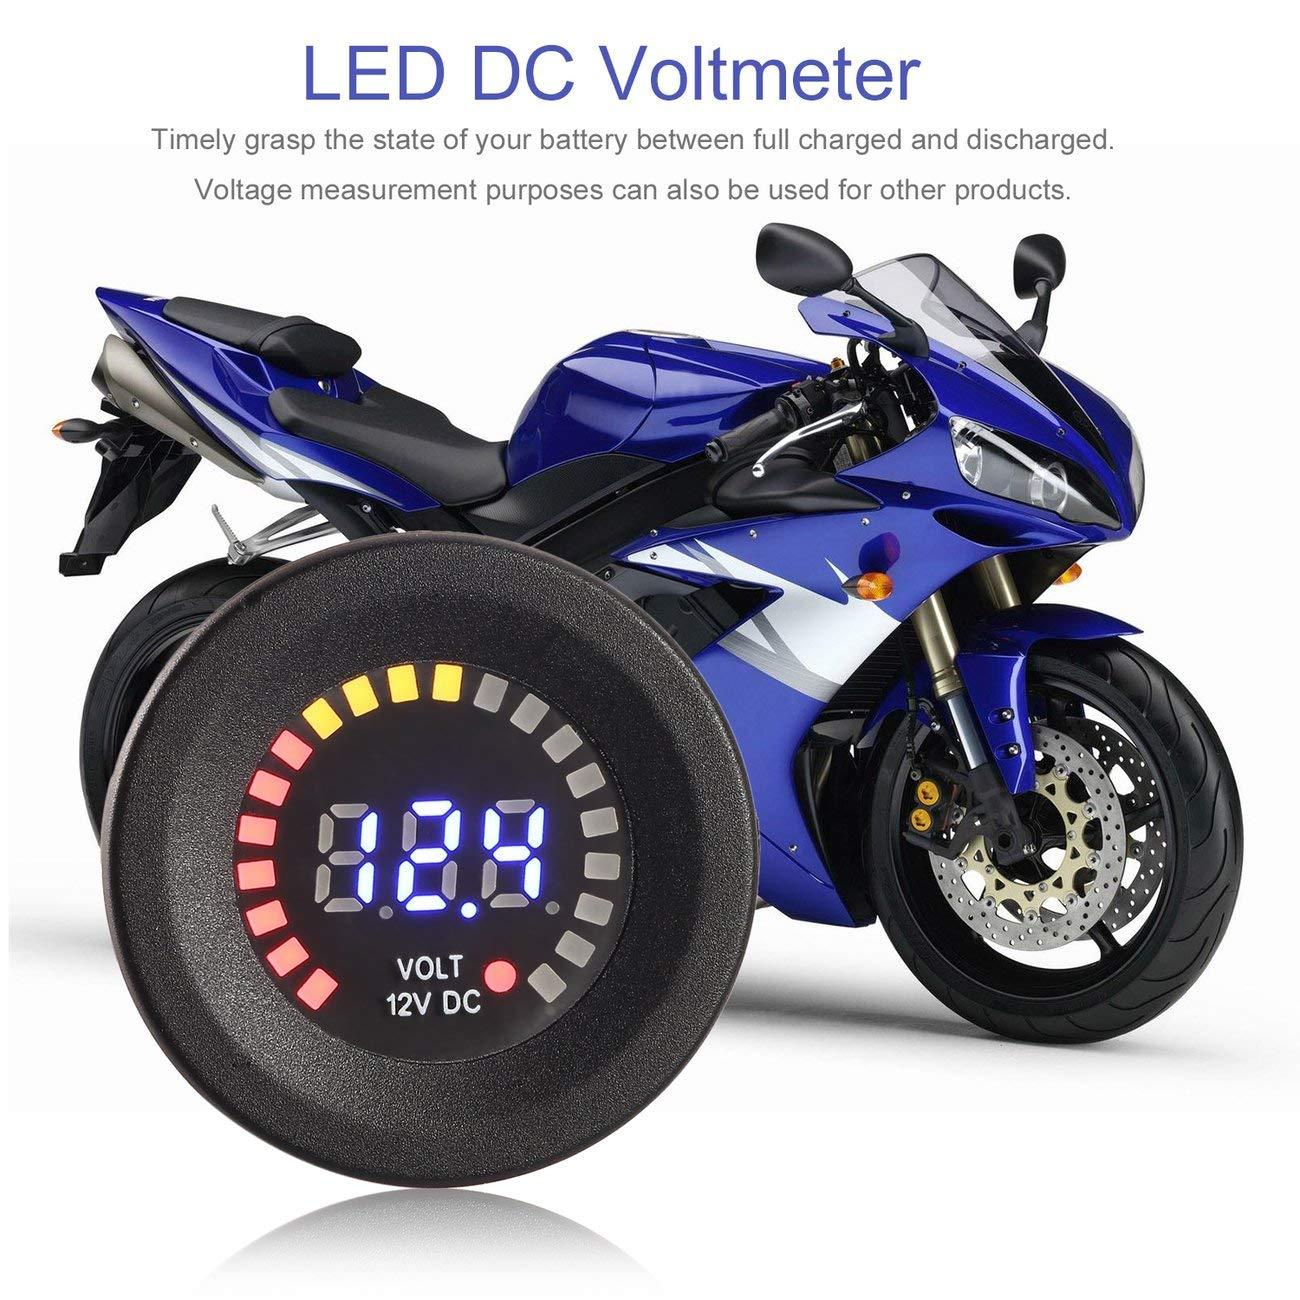 LasVogos Resistente al Calor Impermeable DC 12V Panel Digital Display LED Azul volt/ímetro Voltaje voltio para la Motocicleta del Coche Negro